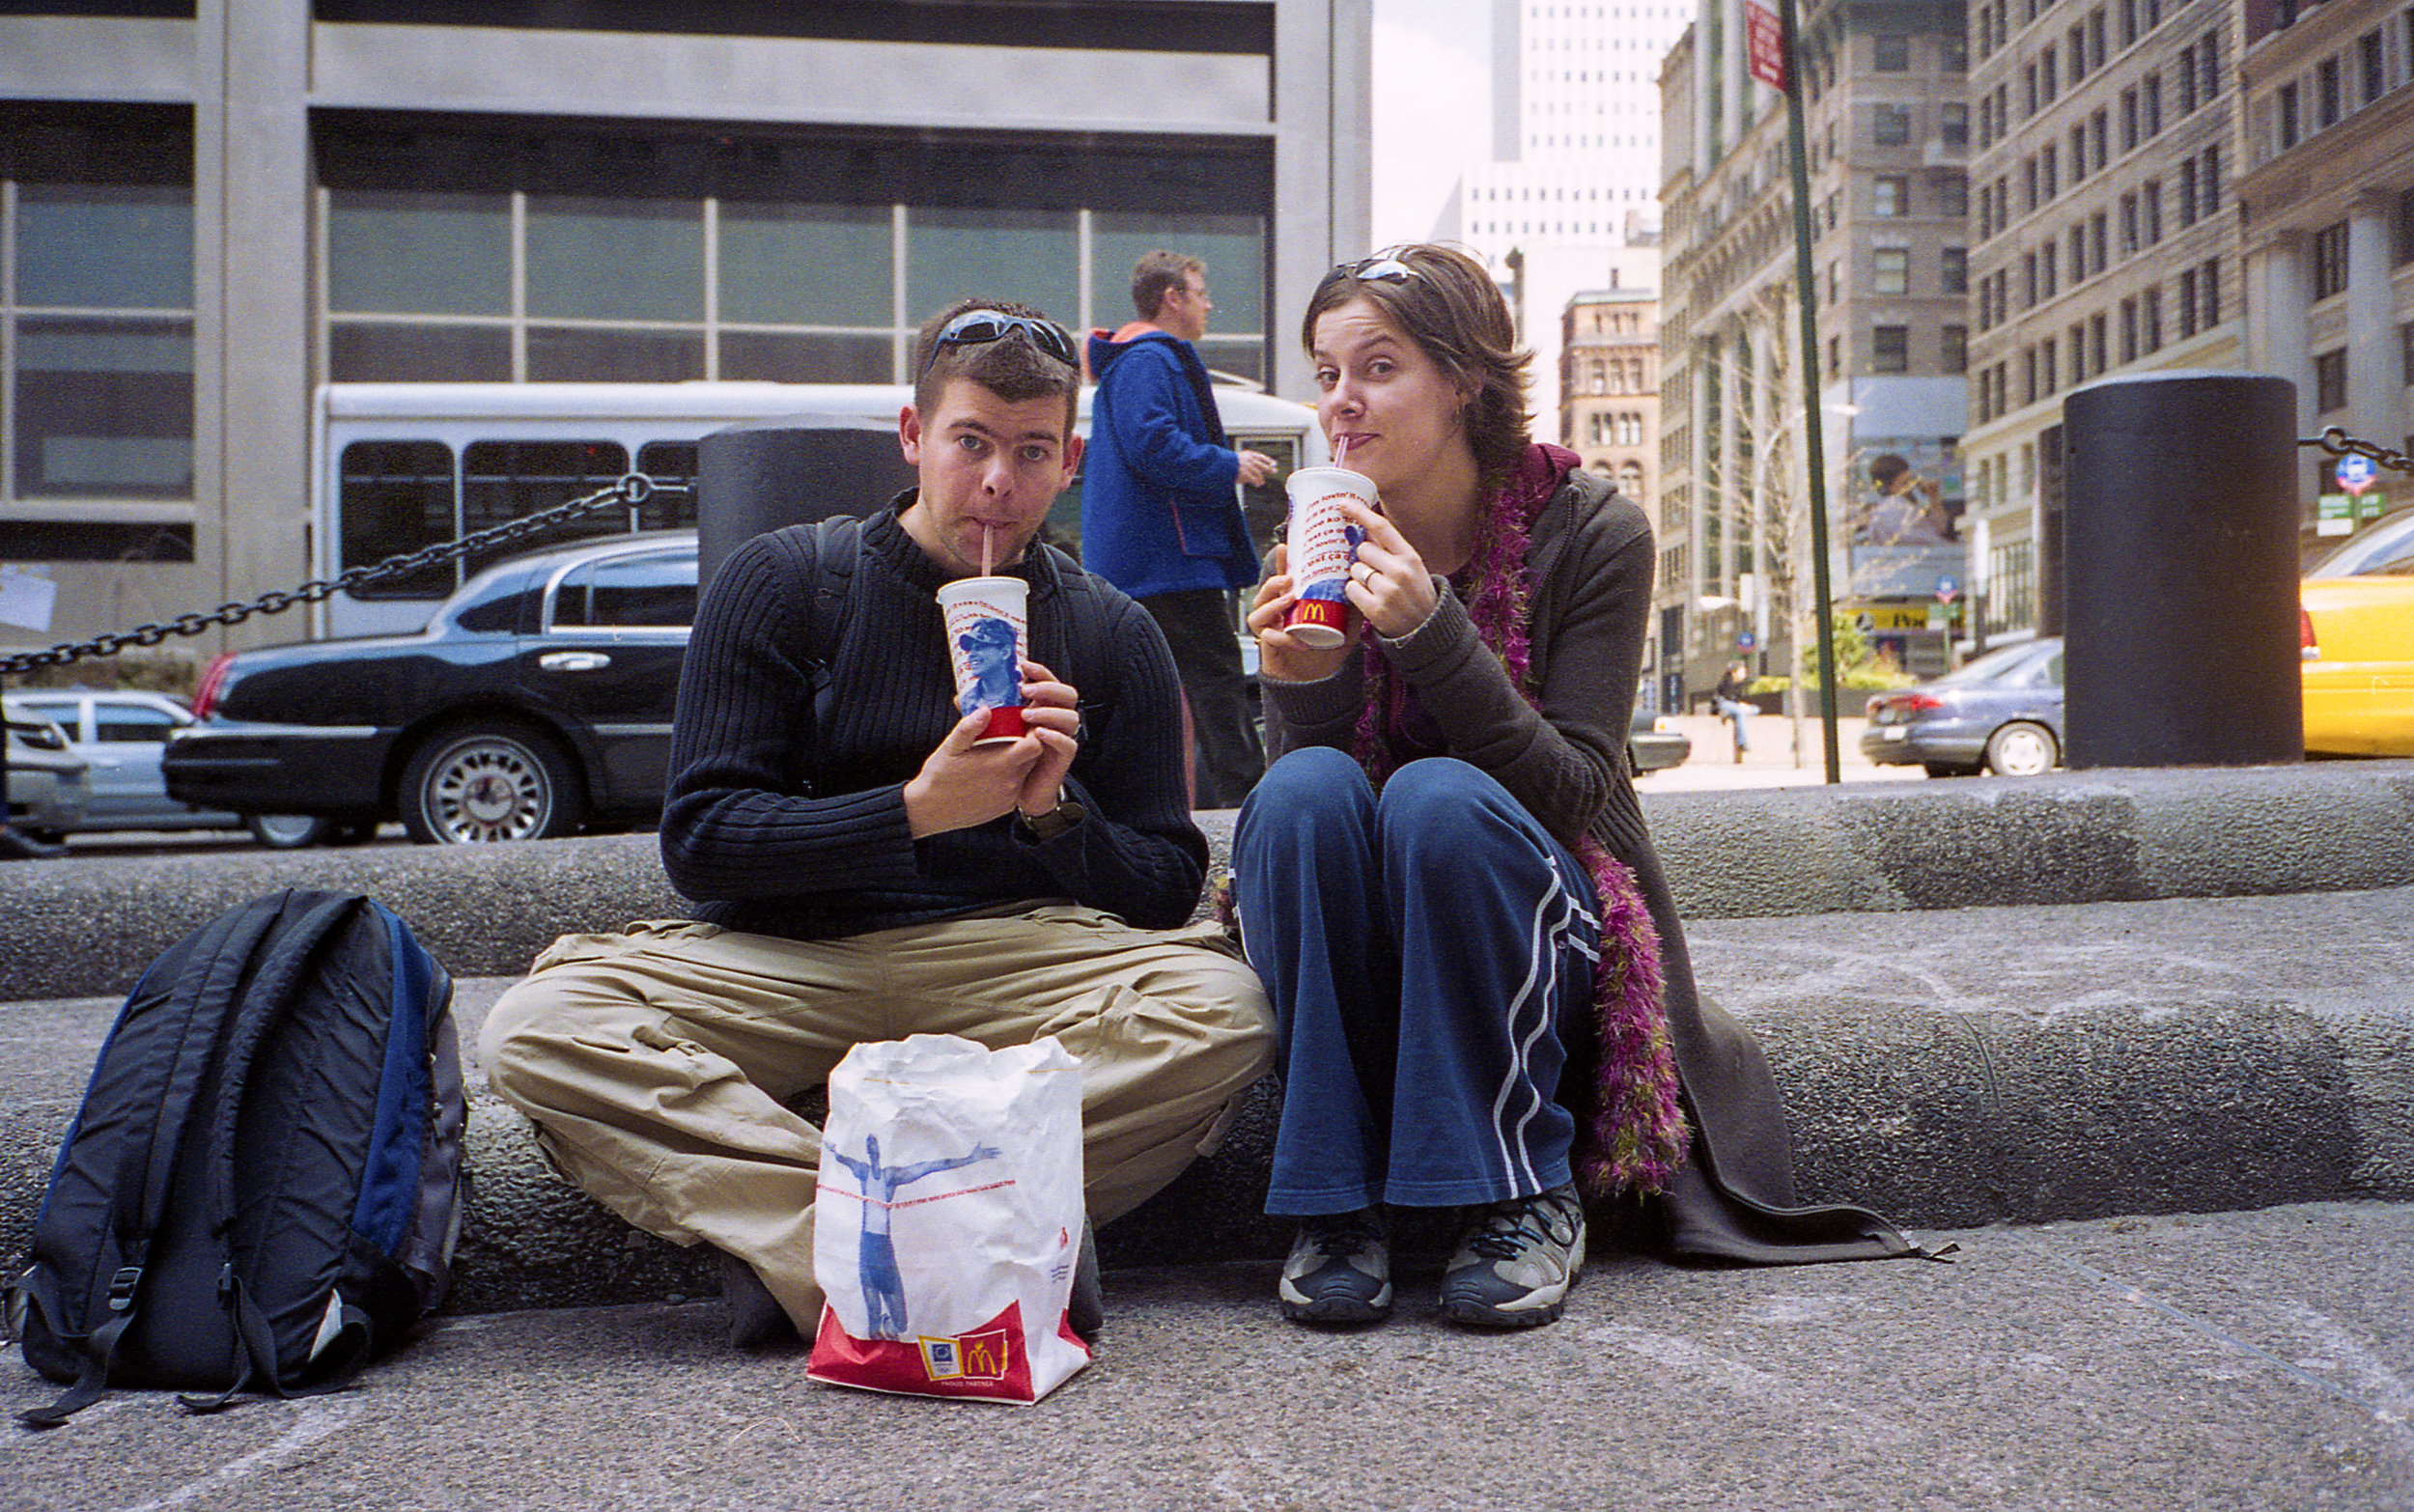 Eating McDonald's like natives